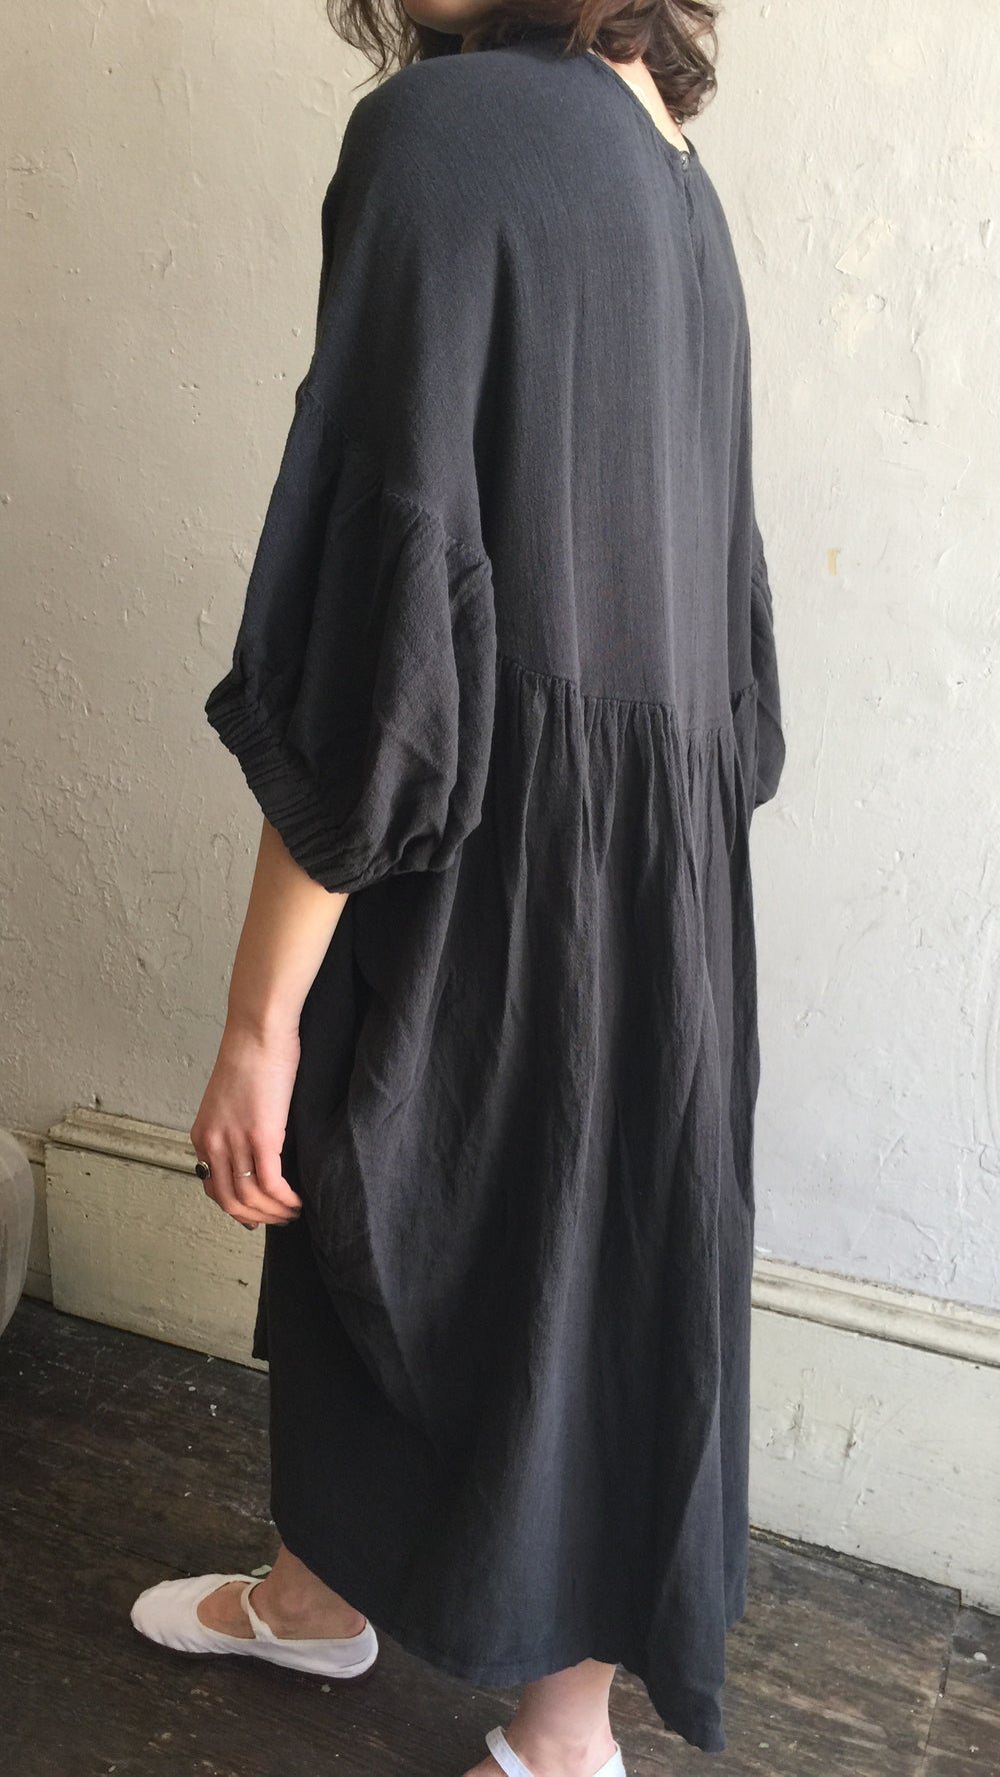 Image of Black Crane Xiao Dress